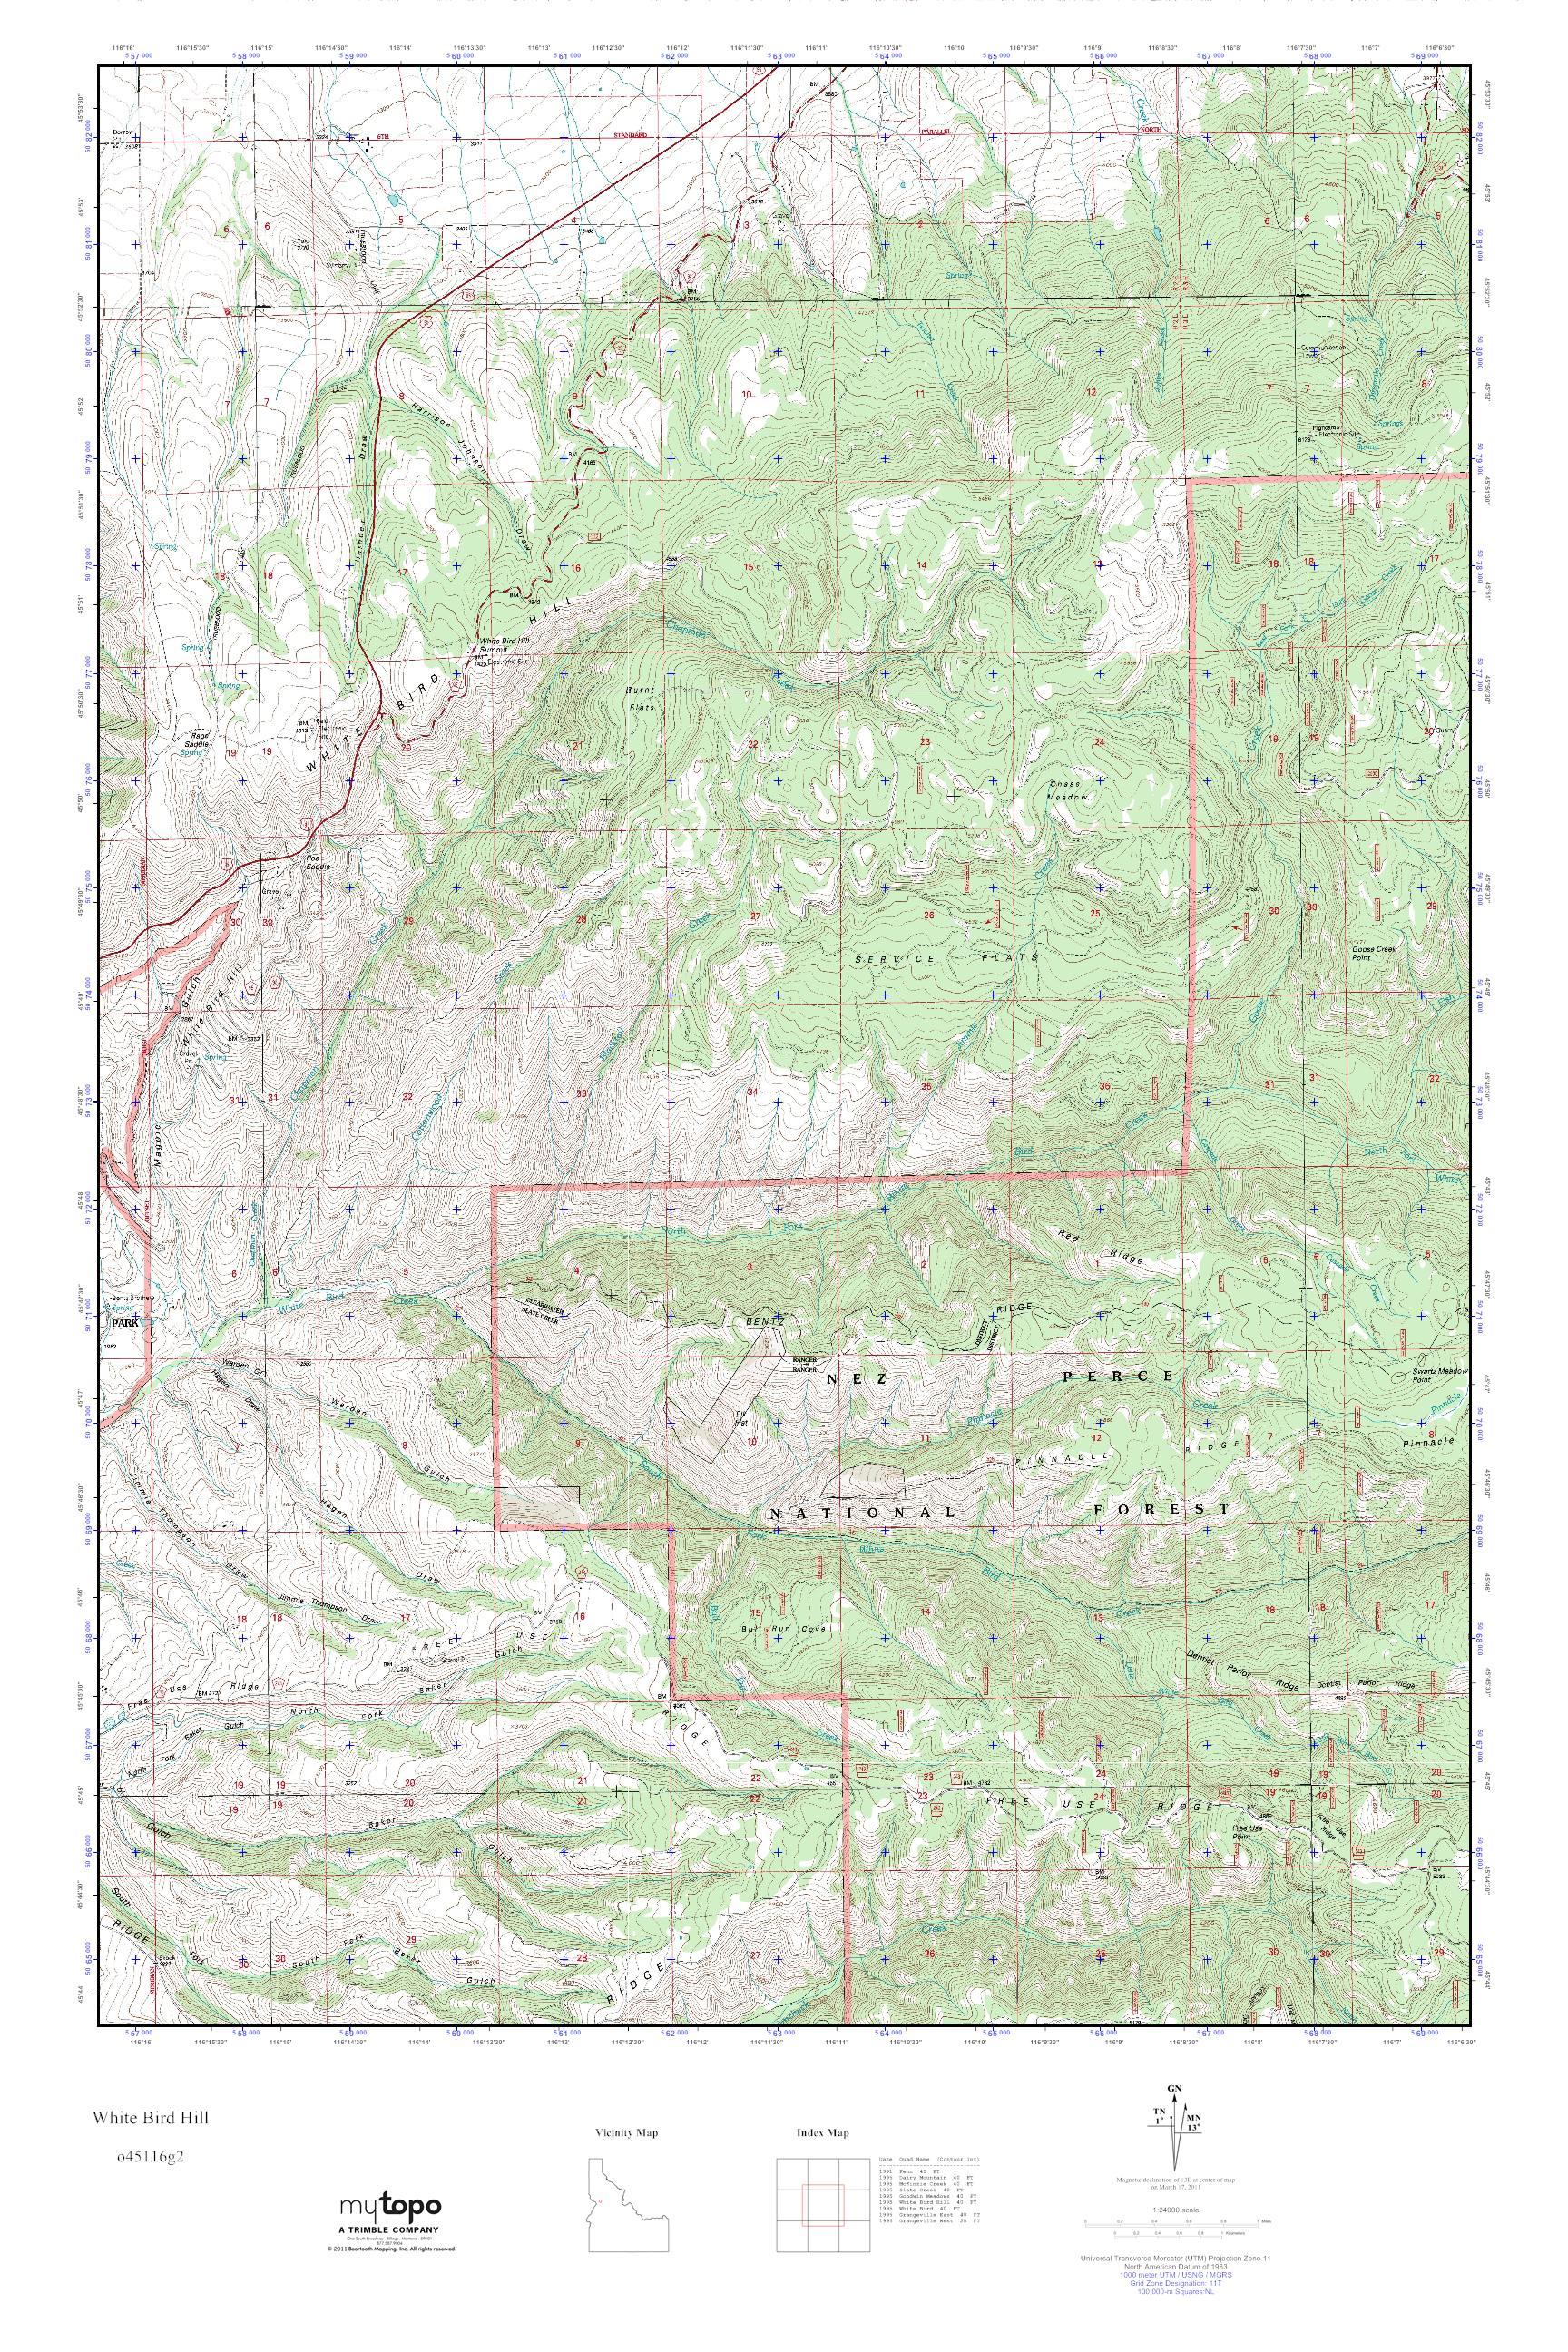 Mytopo White Bird Hill Idaho Usgs Quad Topo Map